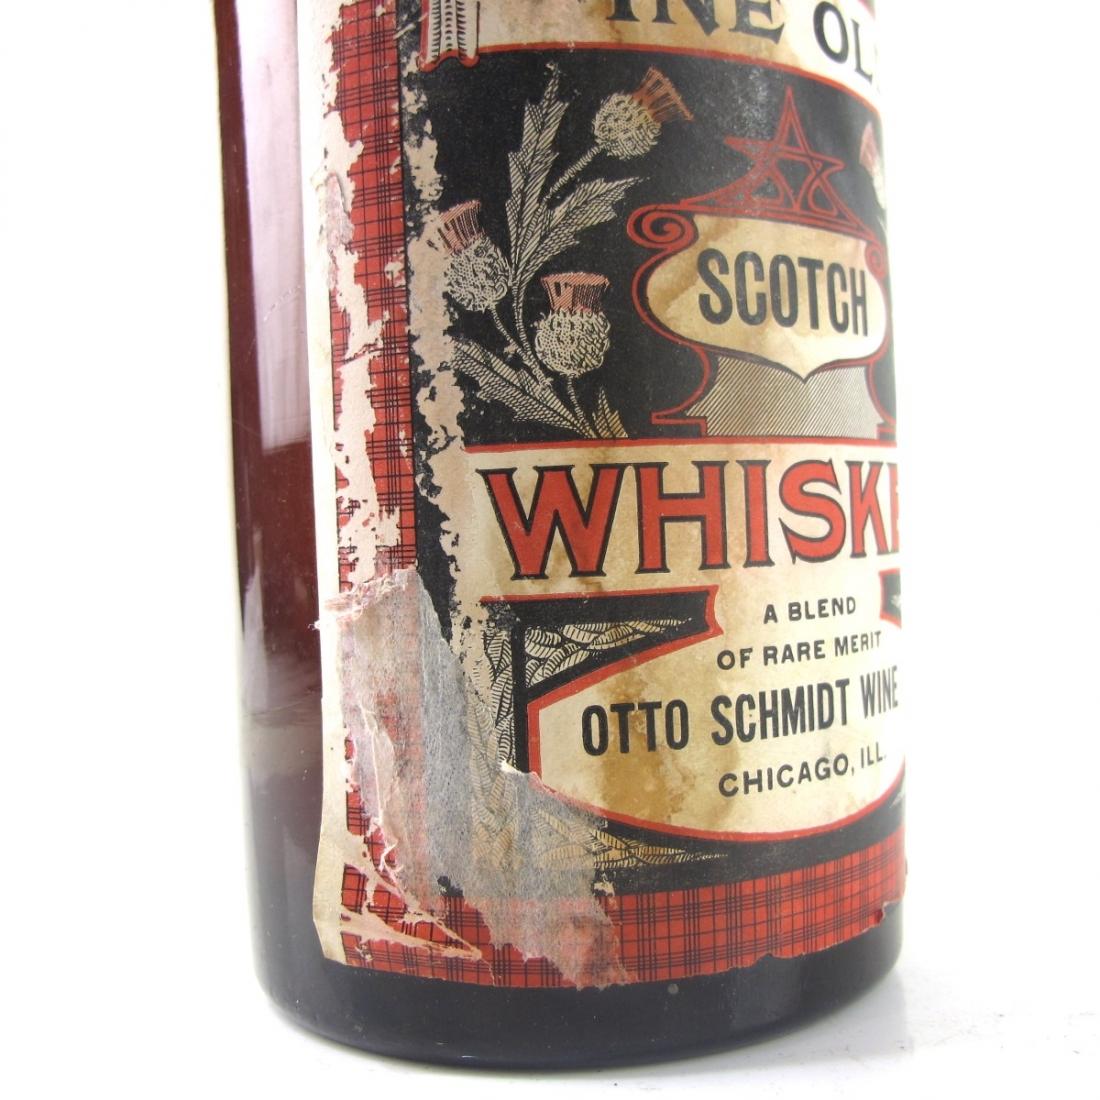 Otto Schmidt Wine Co Fine Old Scotch Whisky 1910s